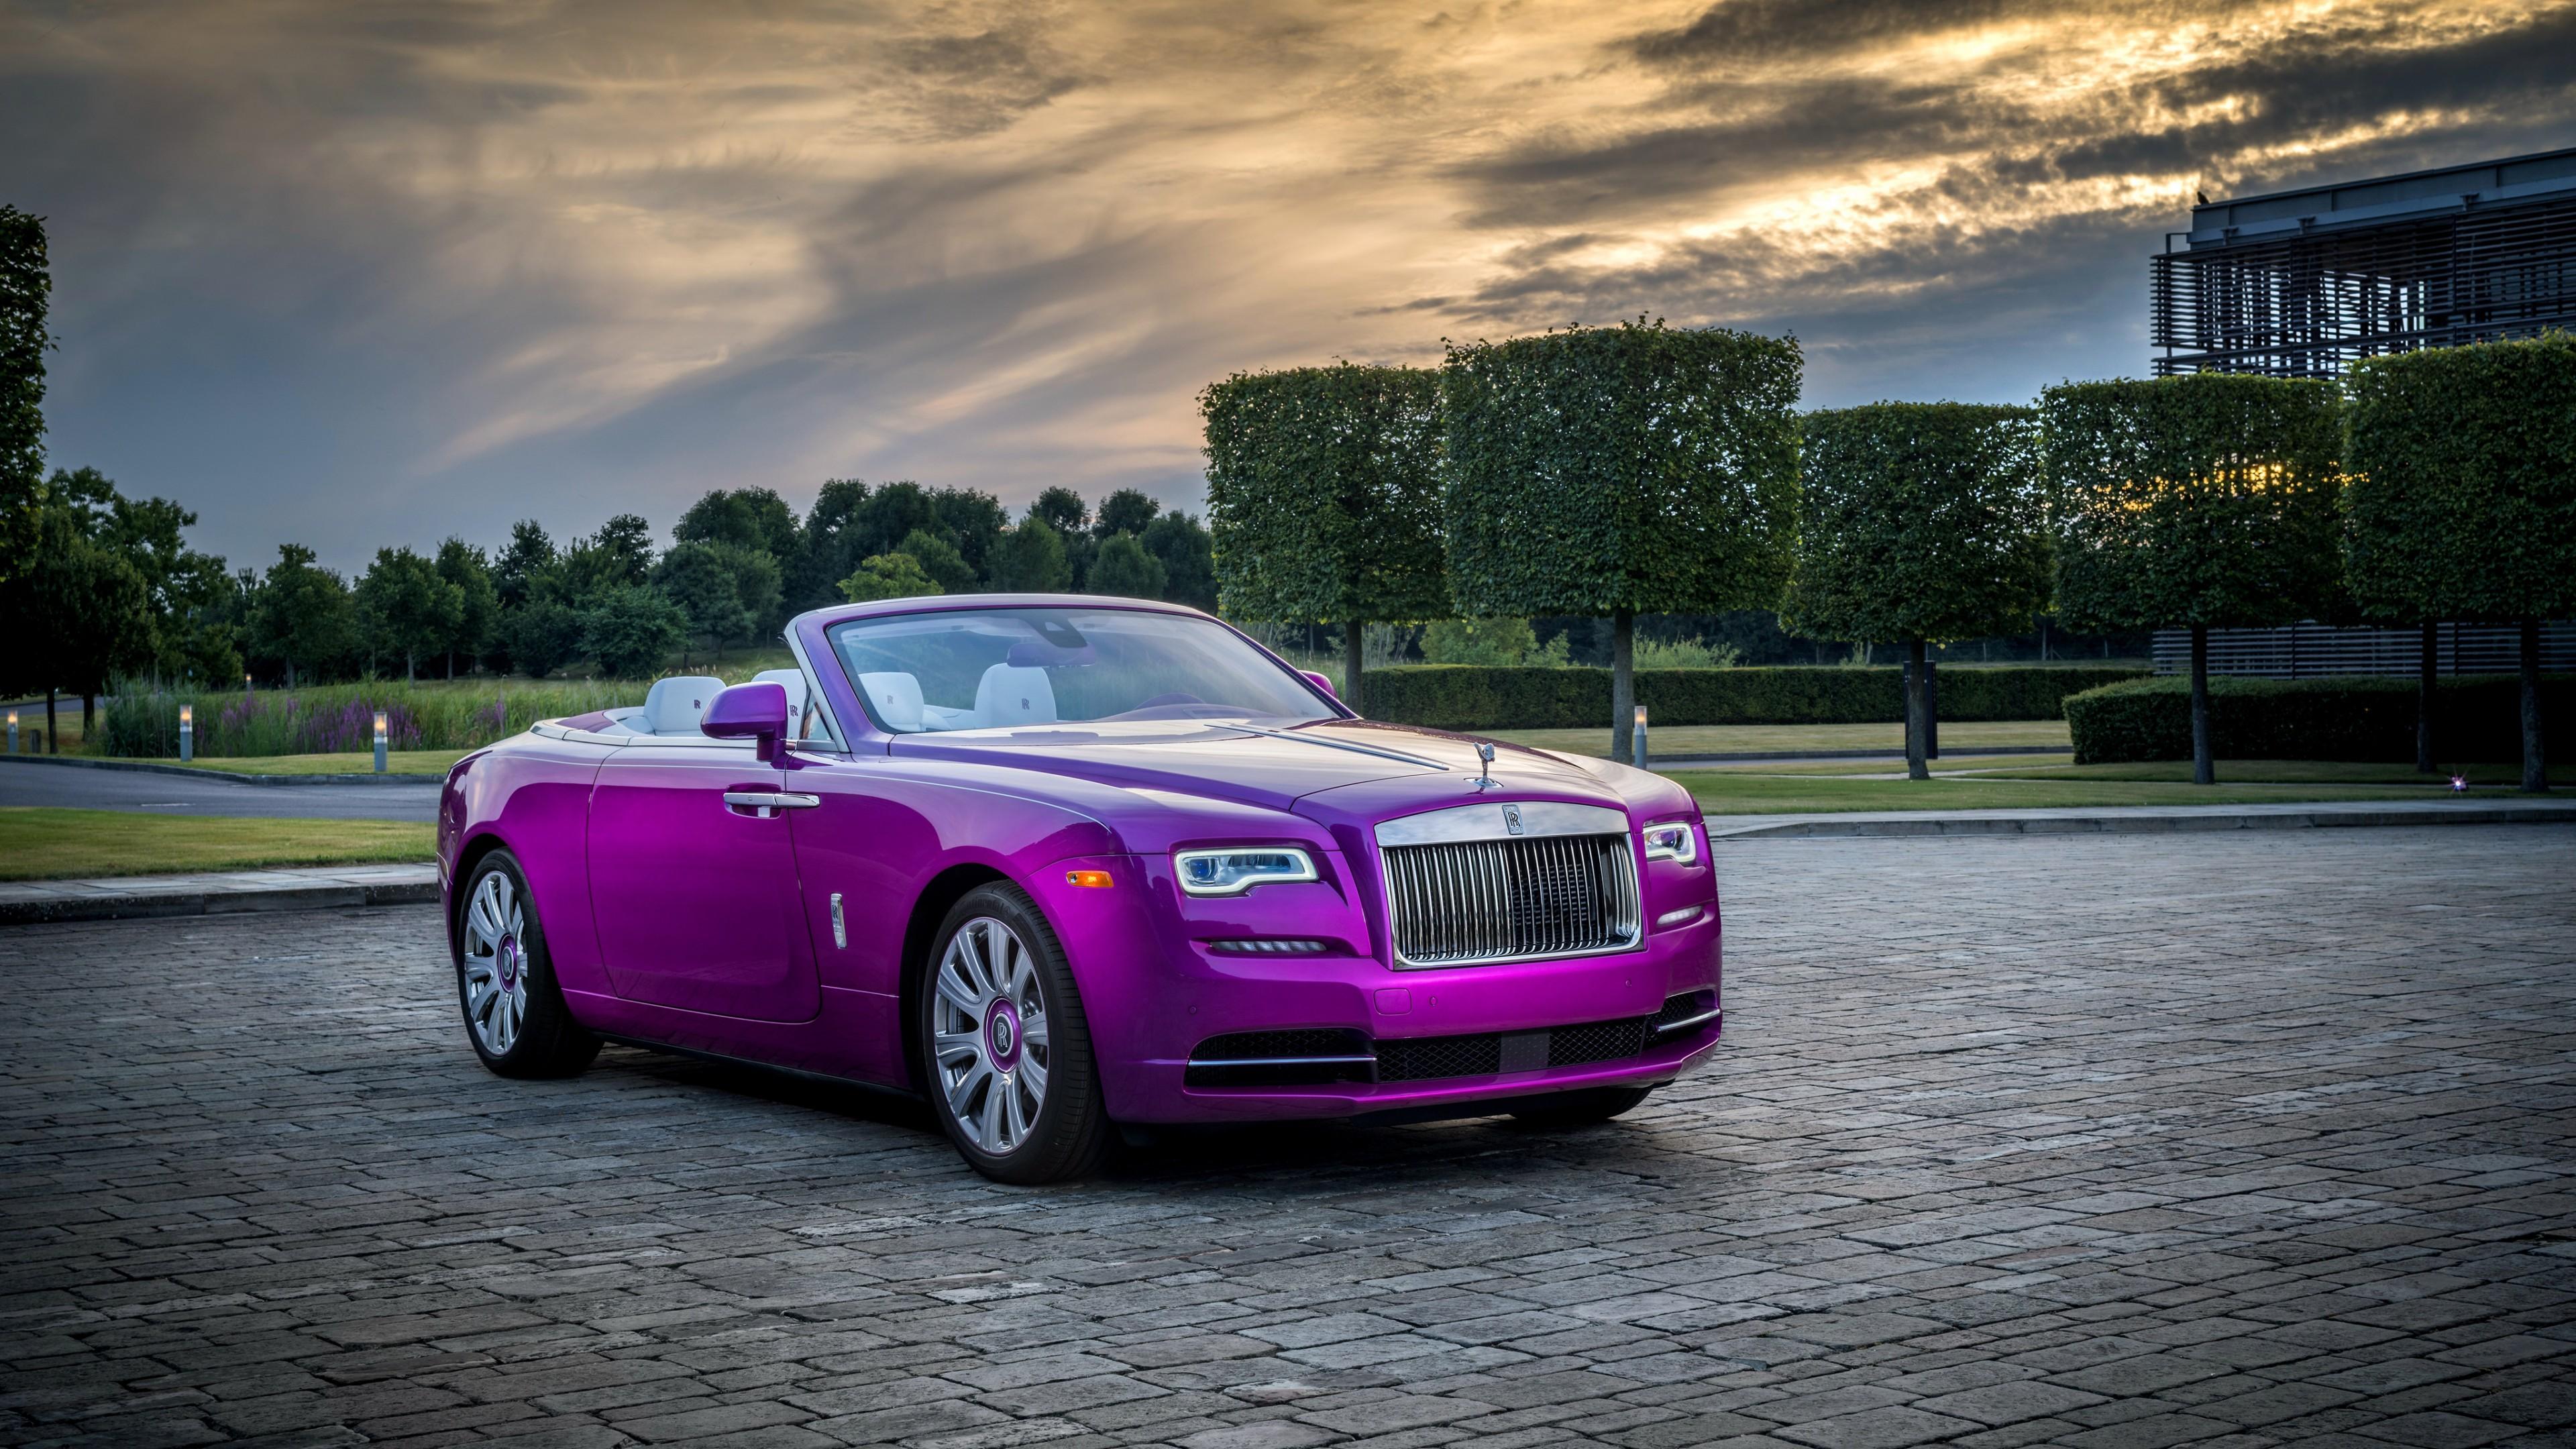 2017 Rolls Royce Dawn In Fuxia 4K Wallpaper   HD Car ...